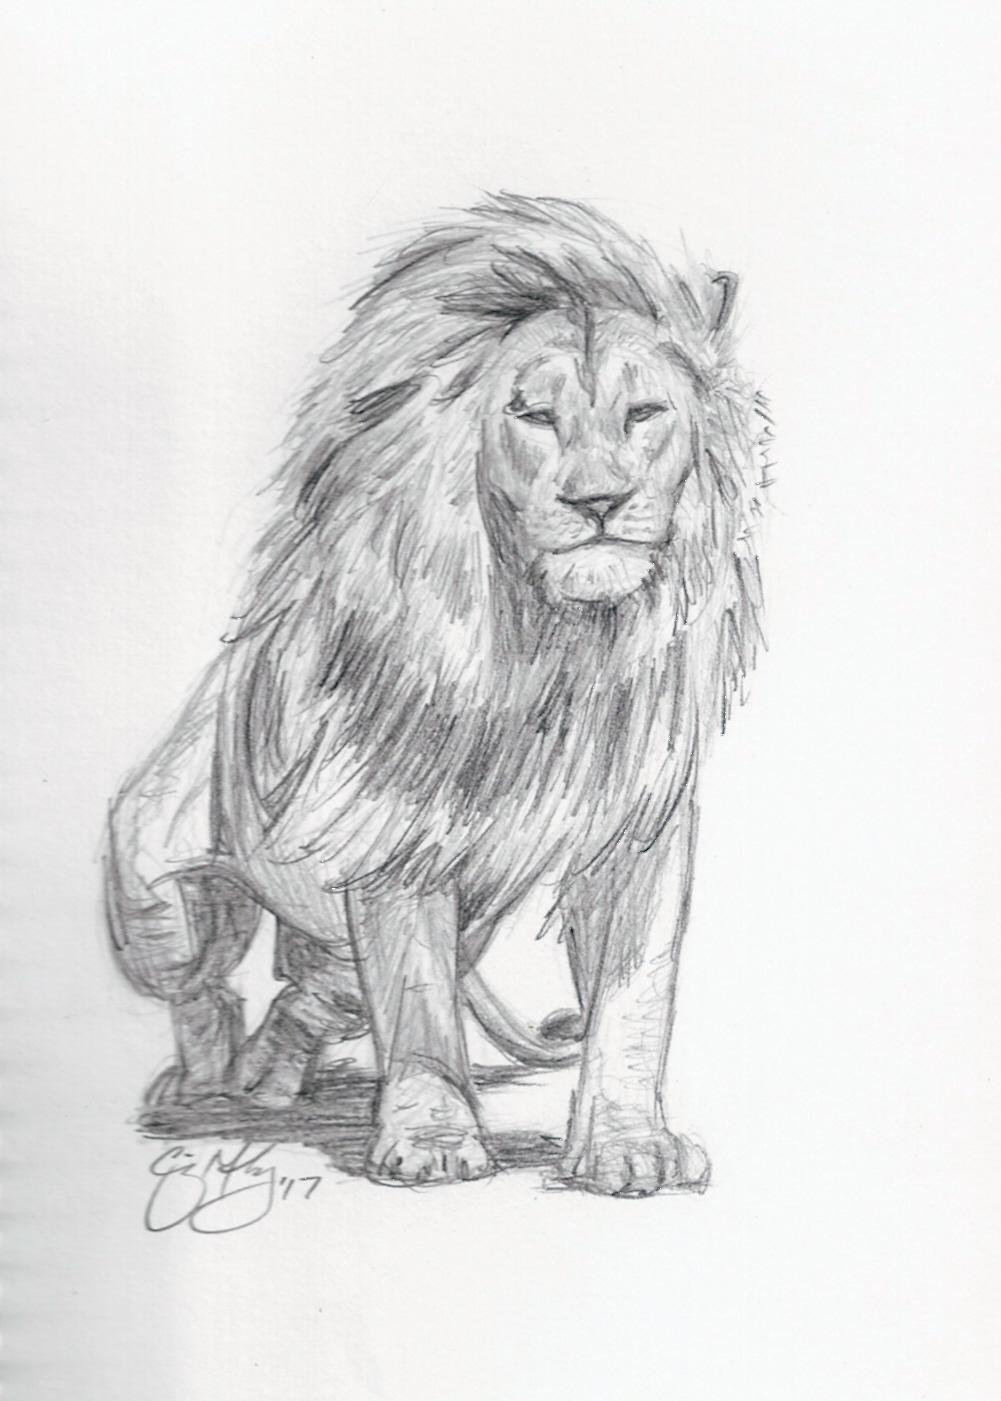 Lion Sketch Craig Mahoney Art Online Store Powered By Storenvy